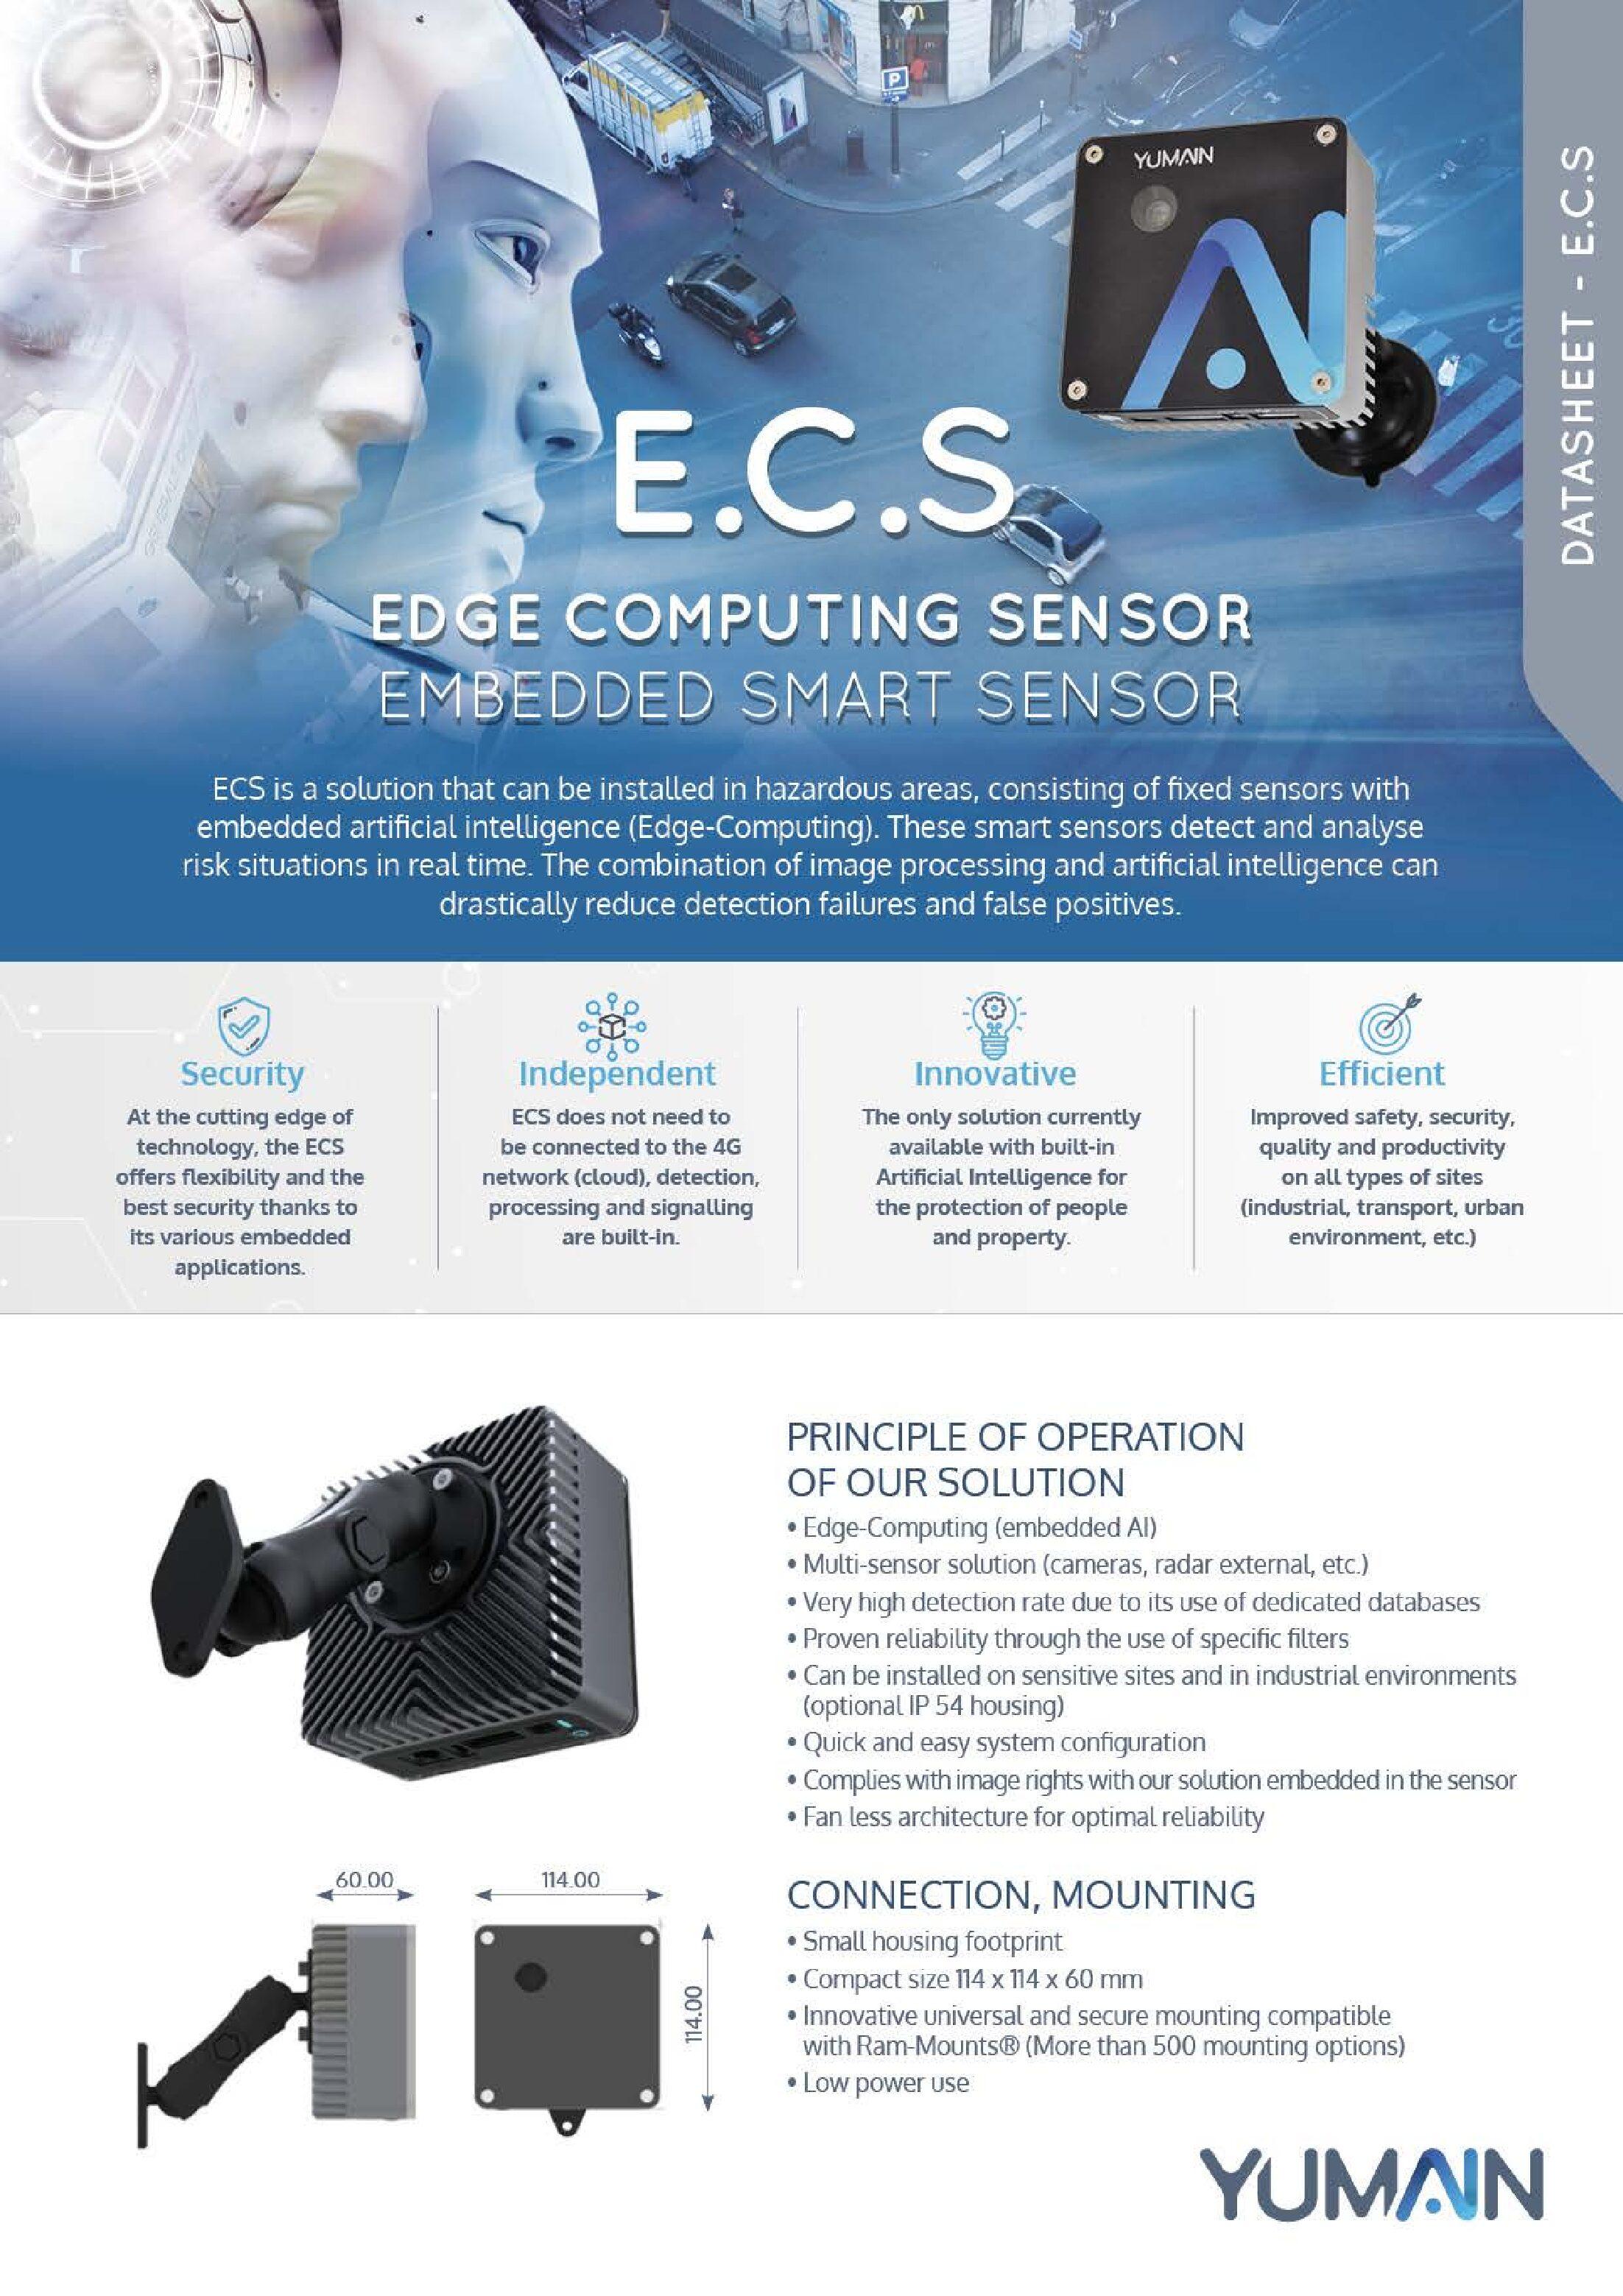 Edge Computing Sensor Data Sheet